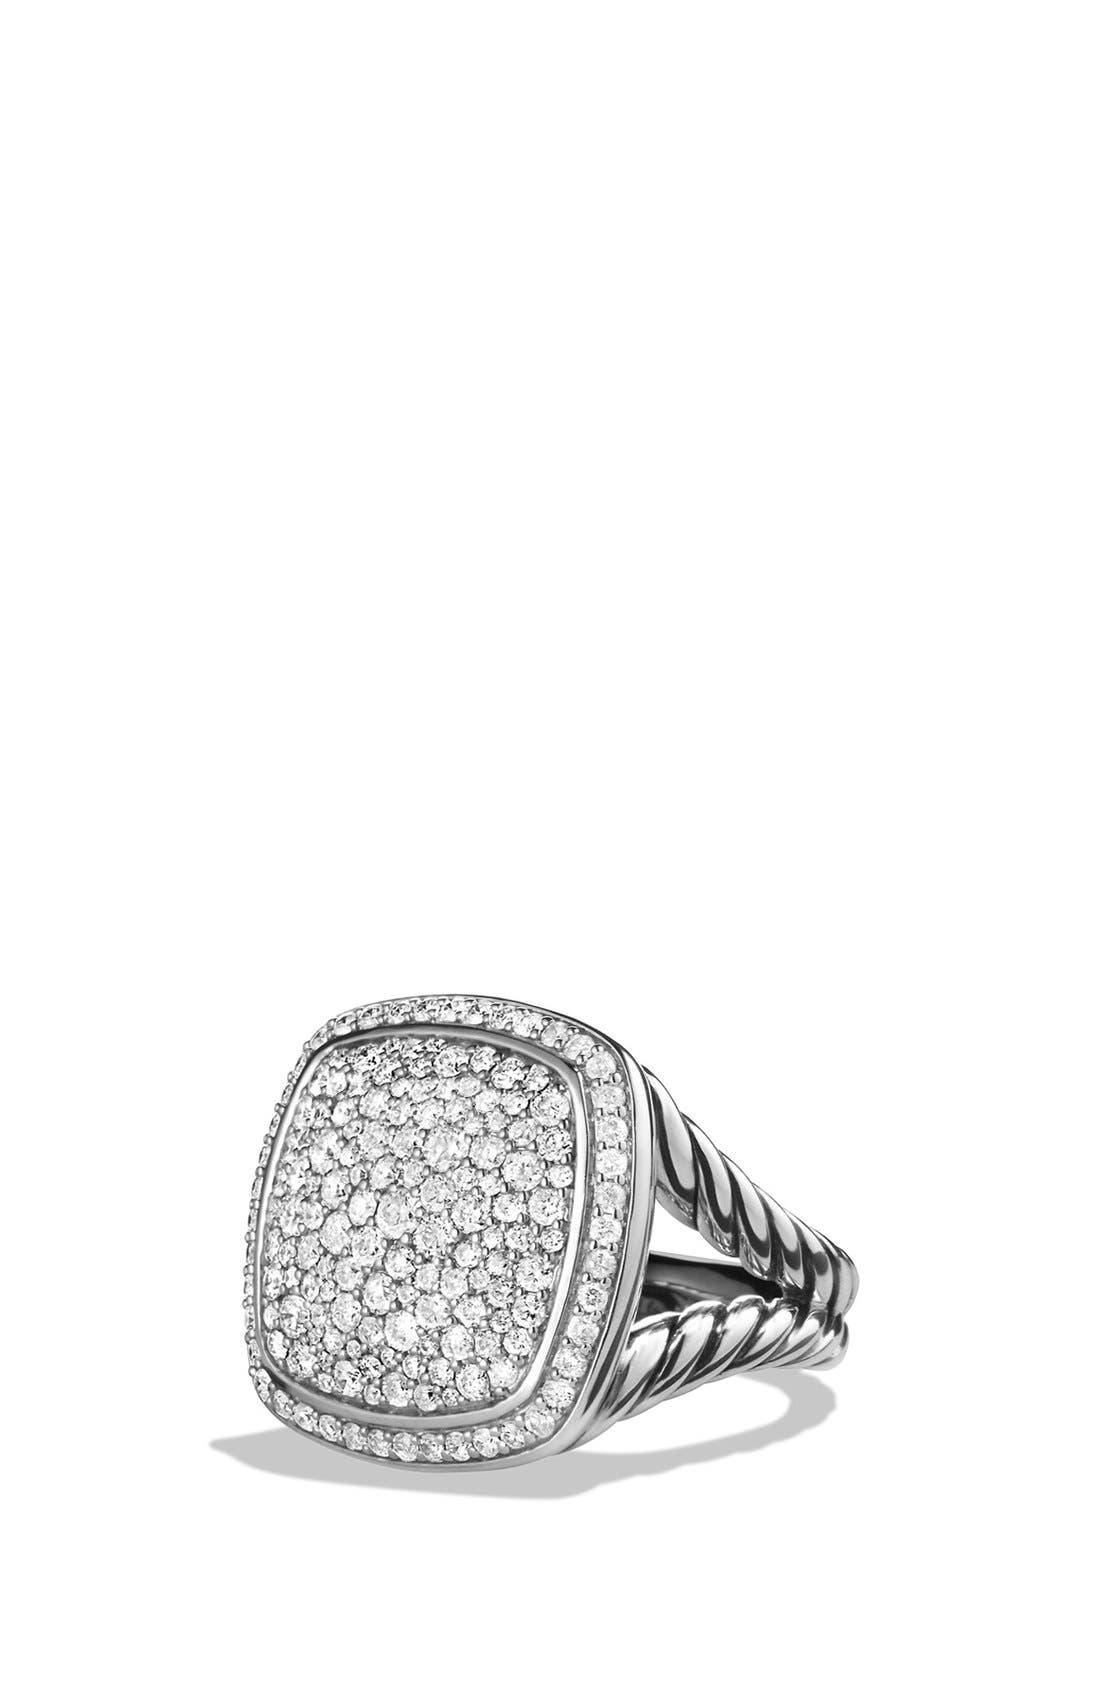 Albion Ring with Diamonds,                         Main,                         color, DIAMOND